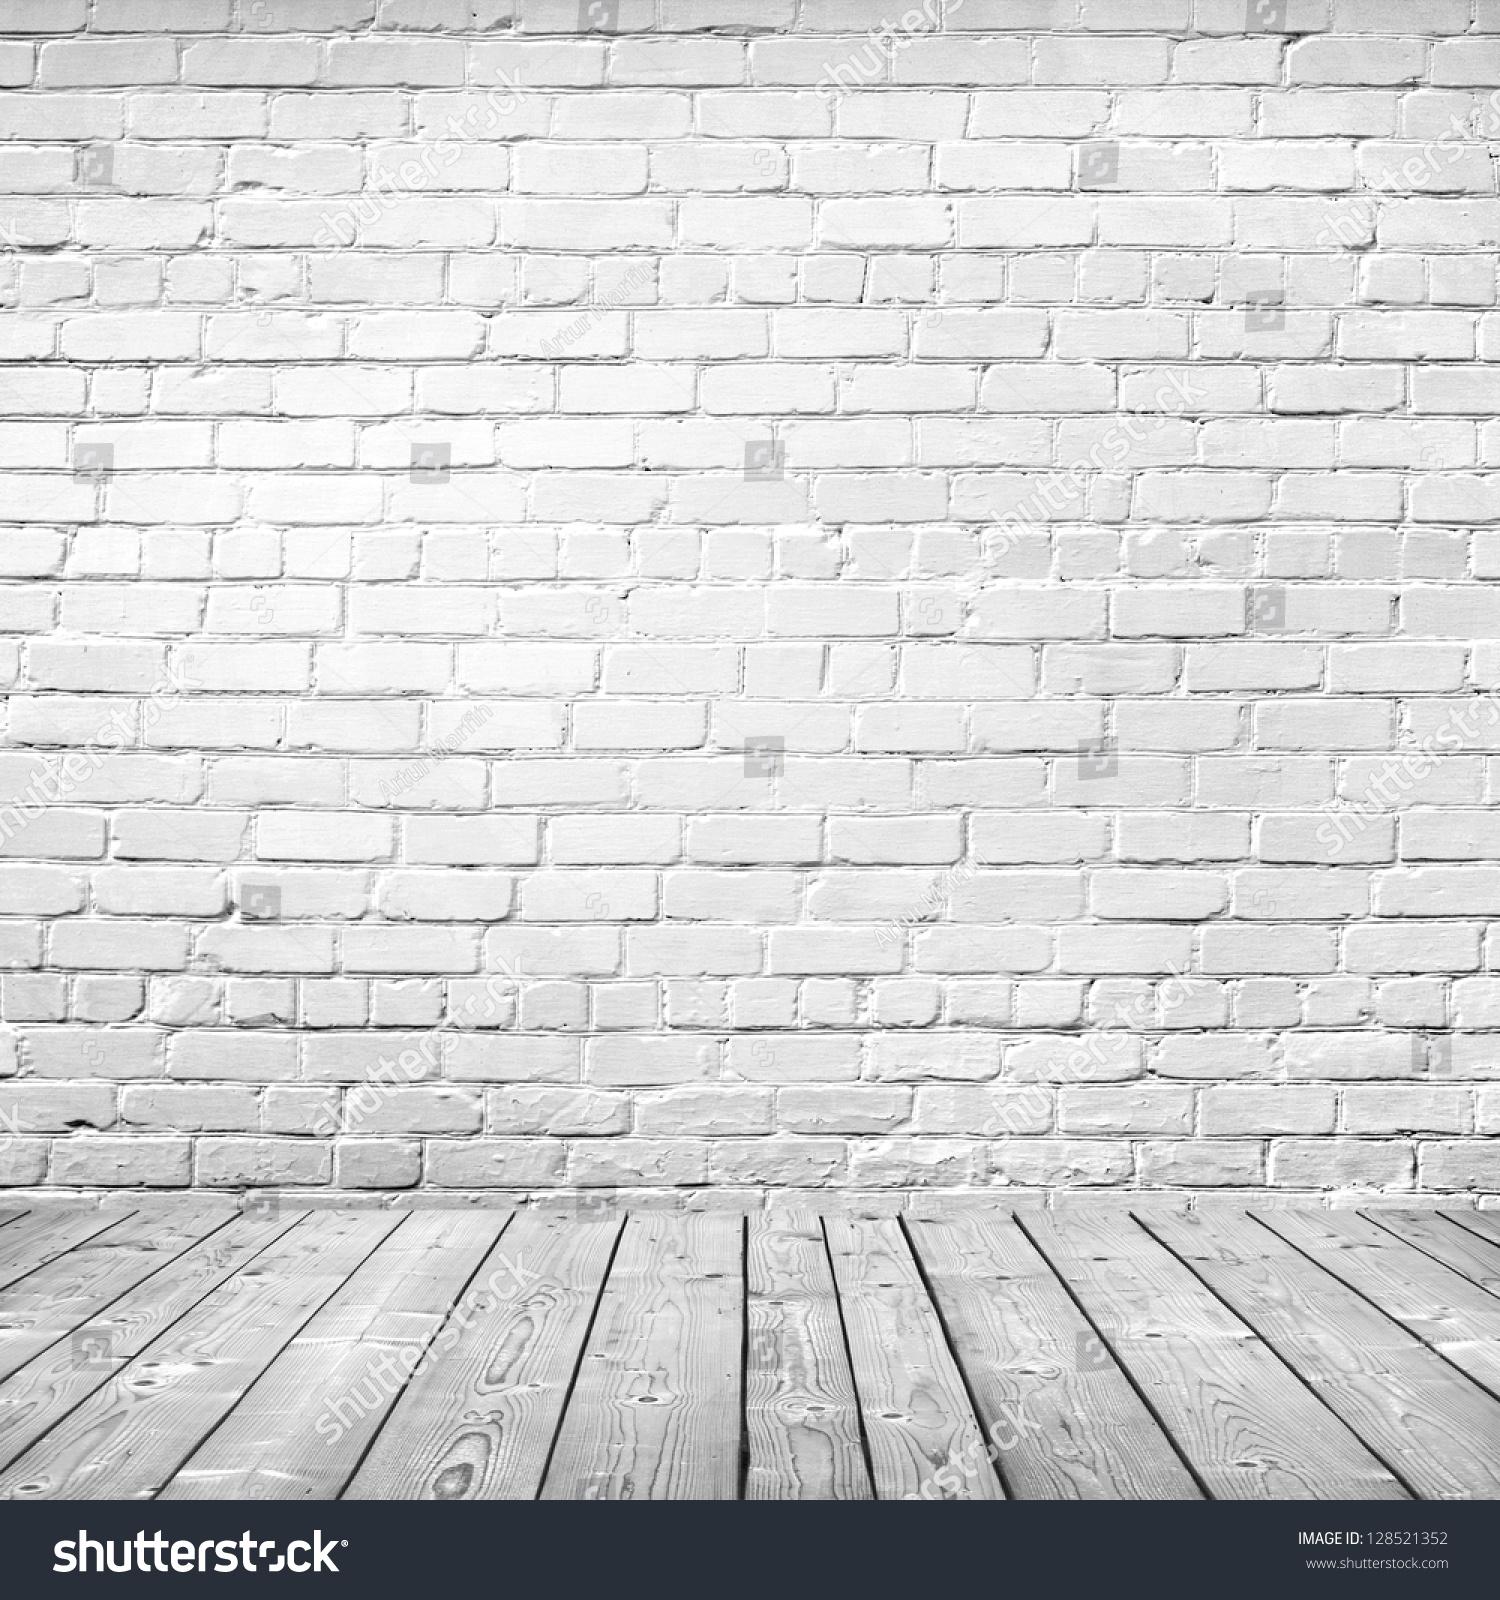 Room Interior Vintage White Brick Wall Stock Photo ...